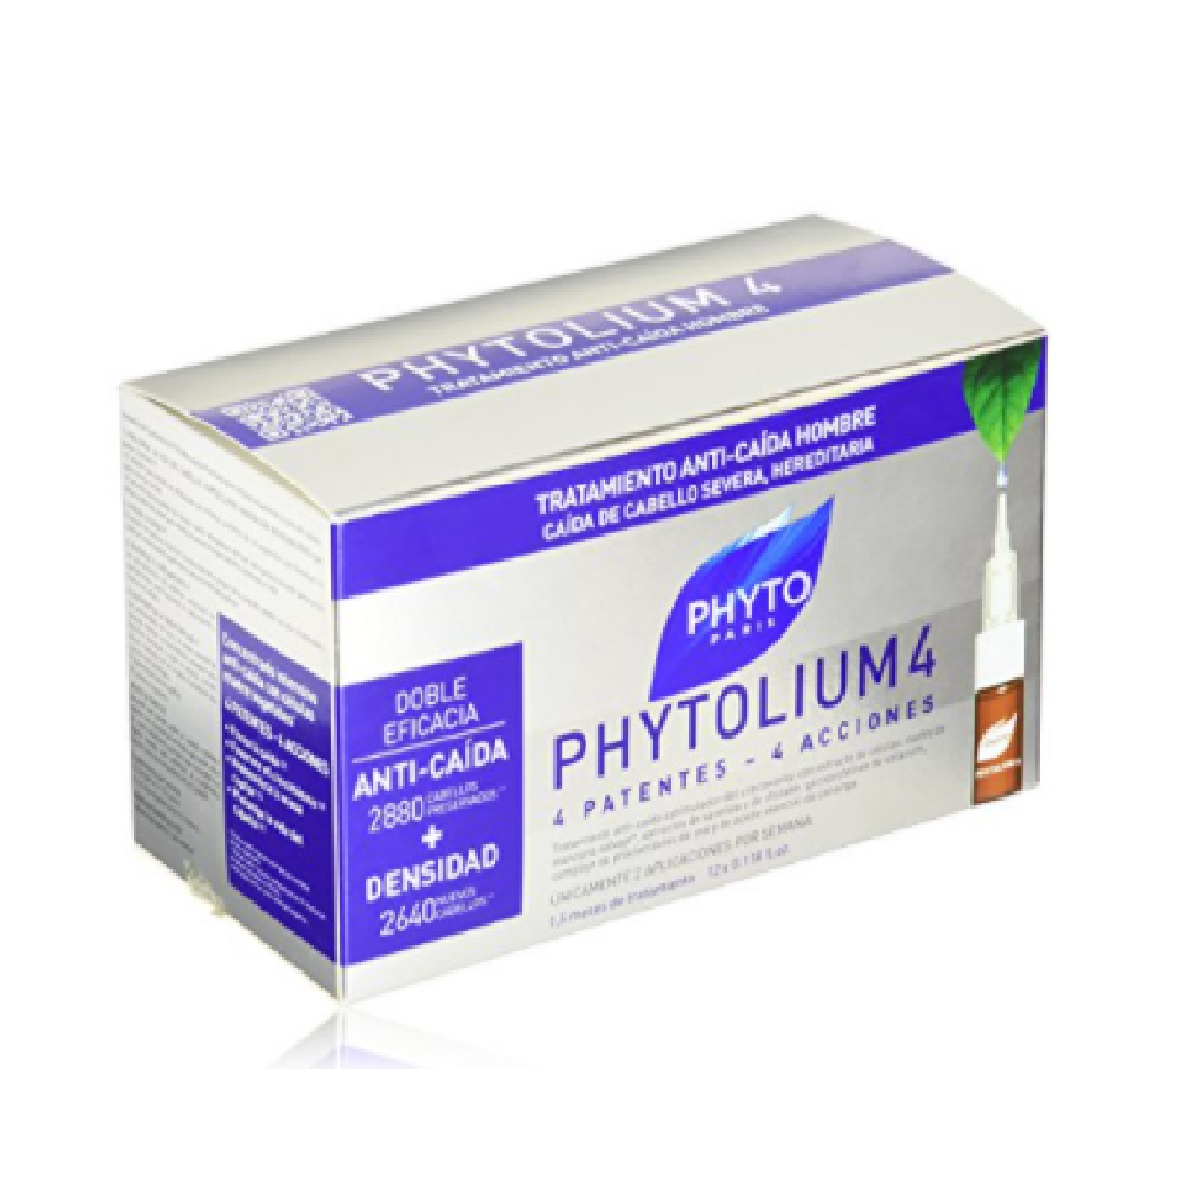 PHYTO PHYTOLIUM 4 ANTI-FALL TREATMENT MAN 12 VIALS